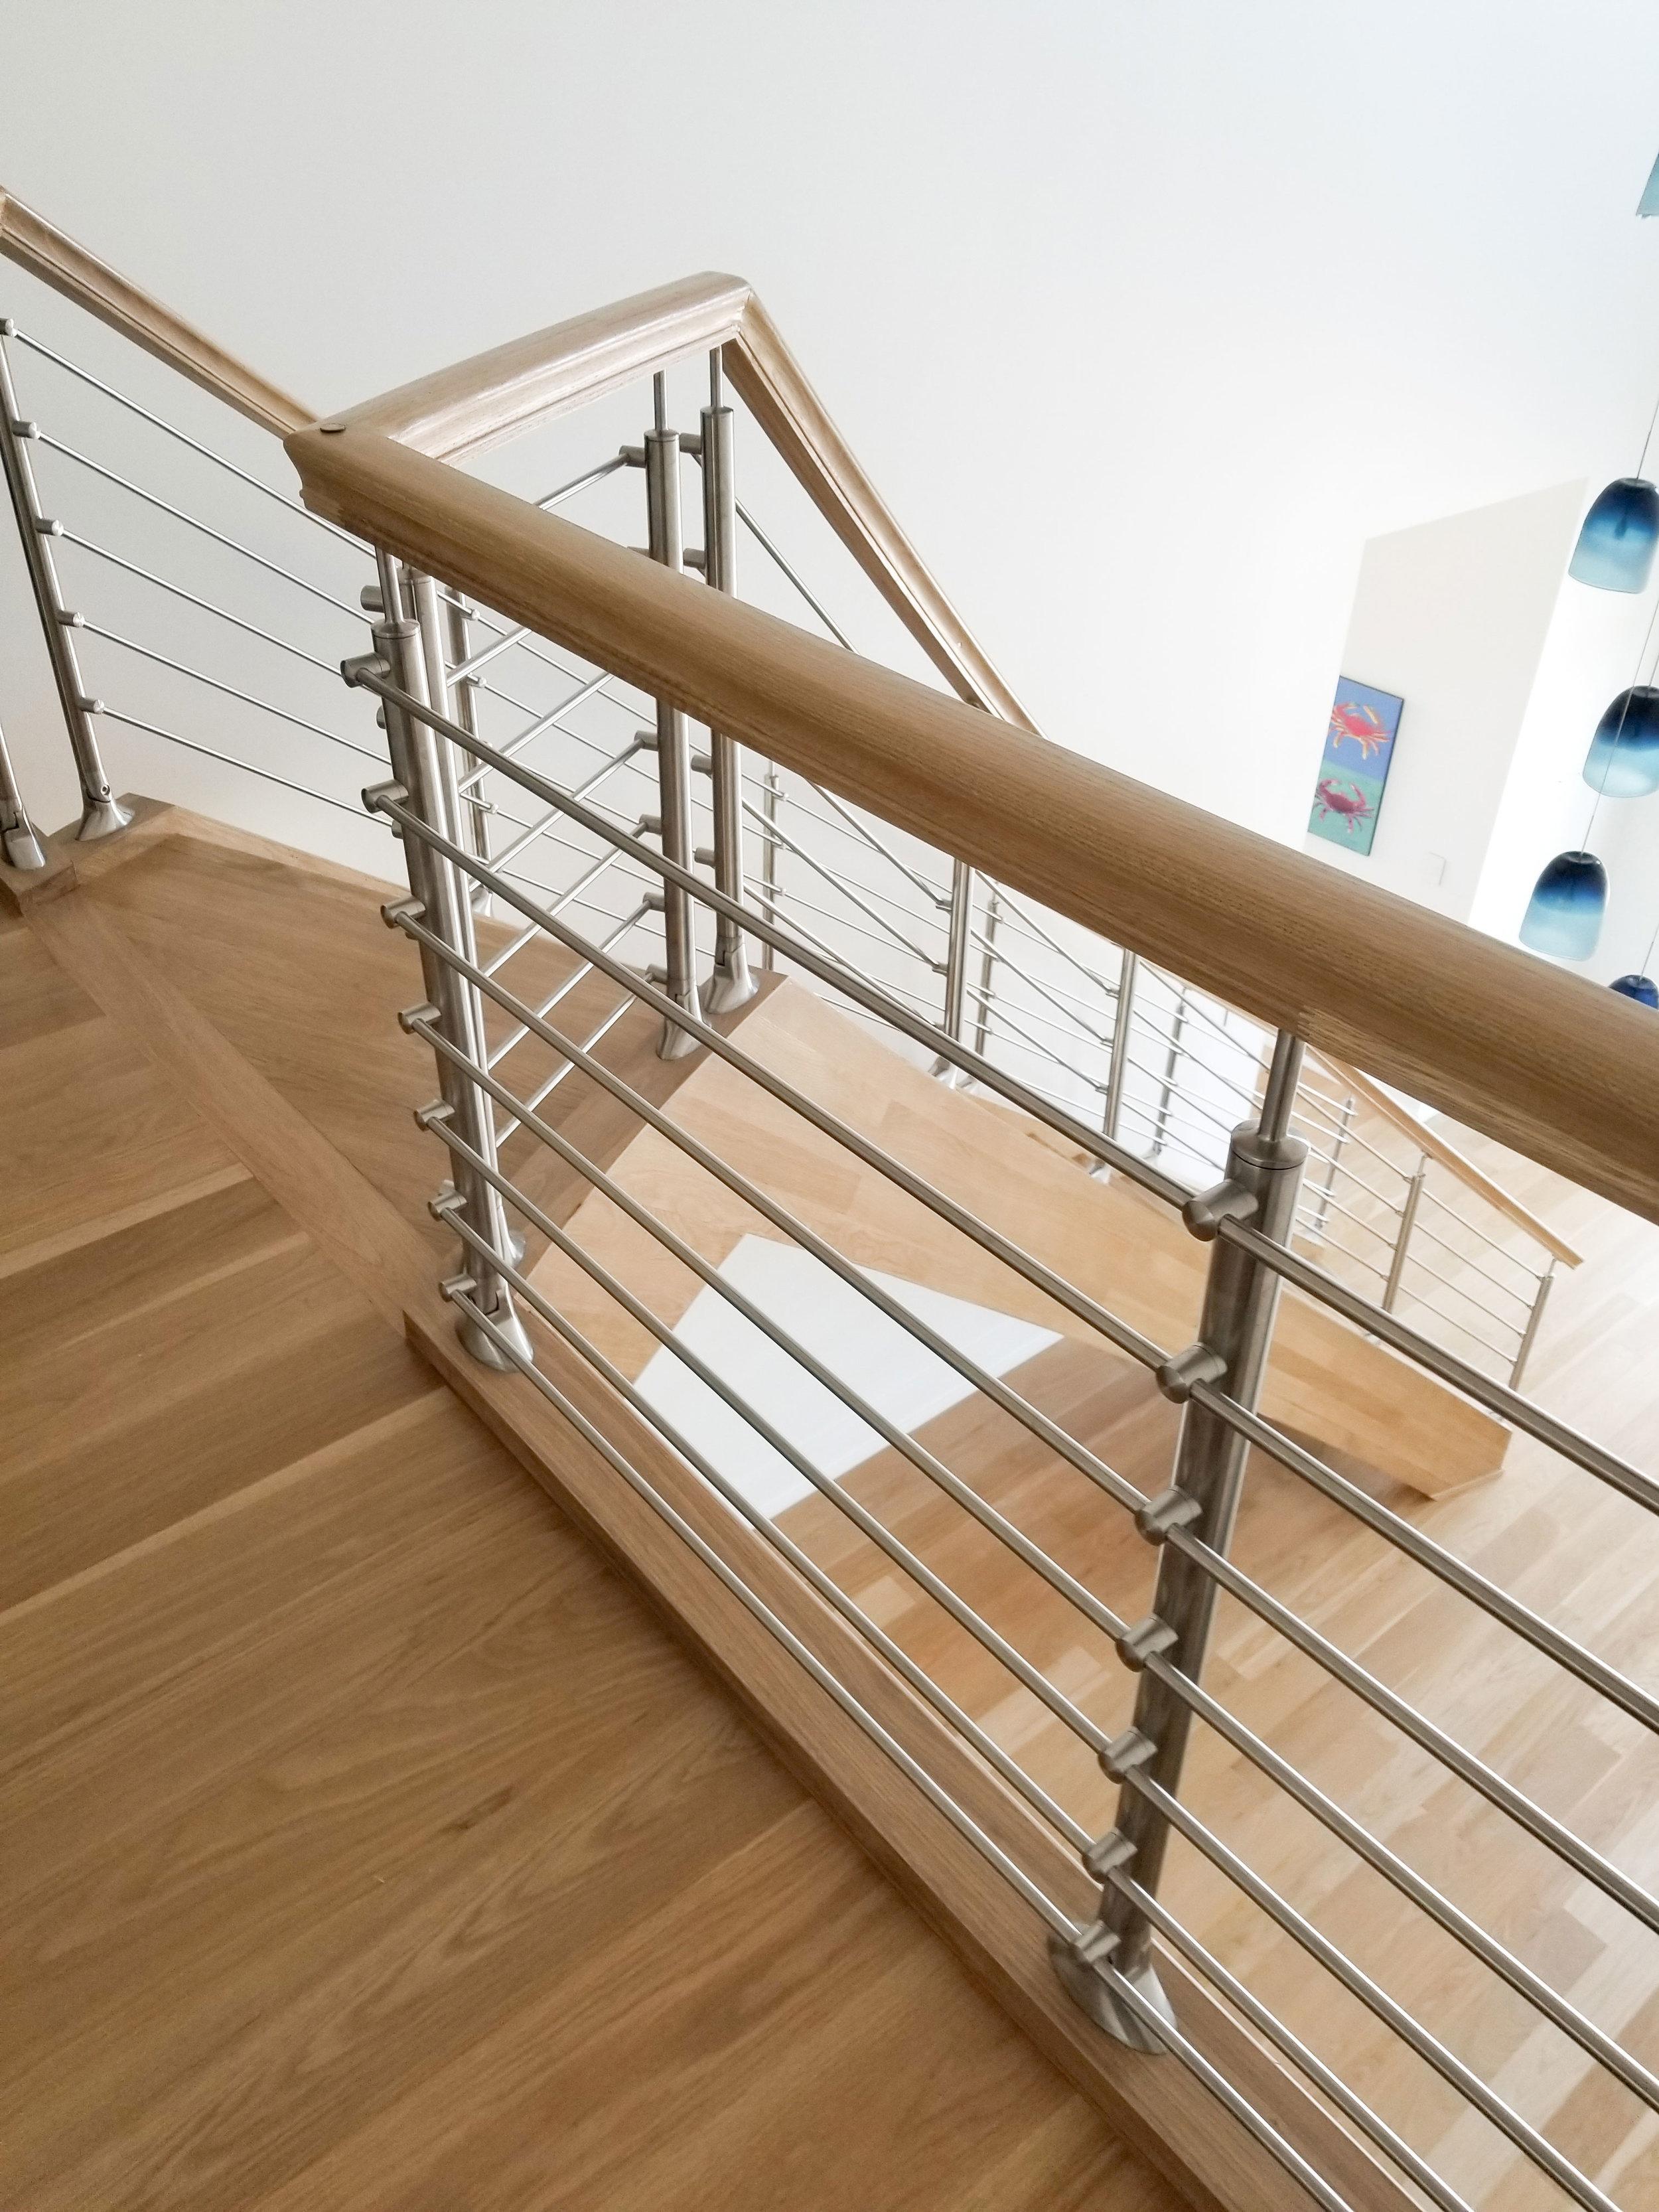 Oak-Pointe_Handrail and Fittings (5).jpg